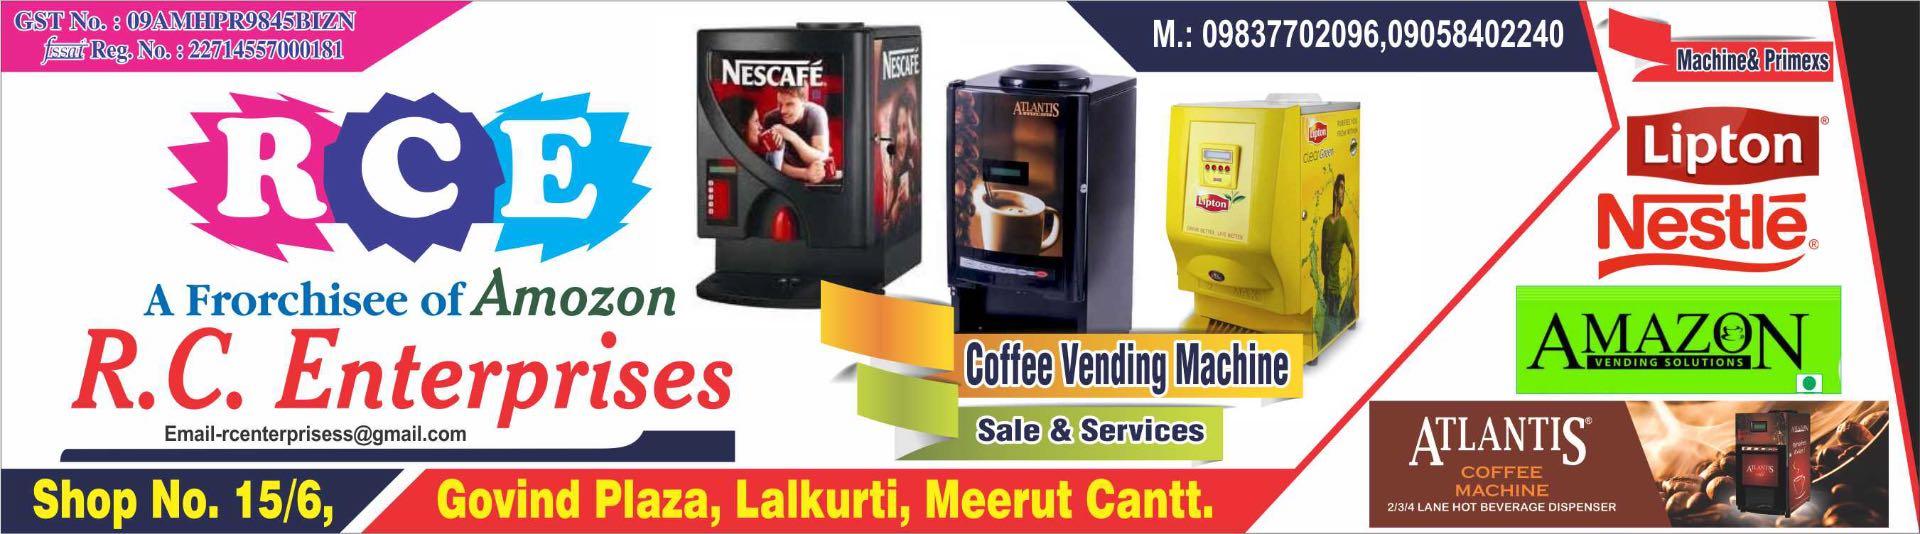 Top Tea Vending Machine Repair & Services in Meerut - Best Tea